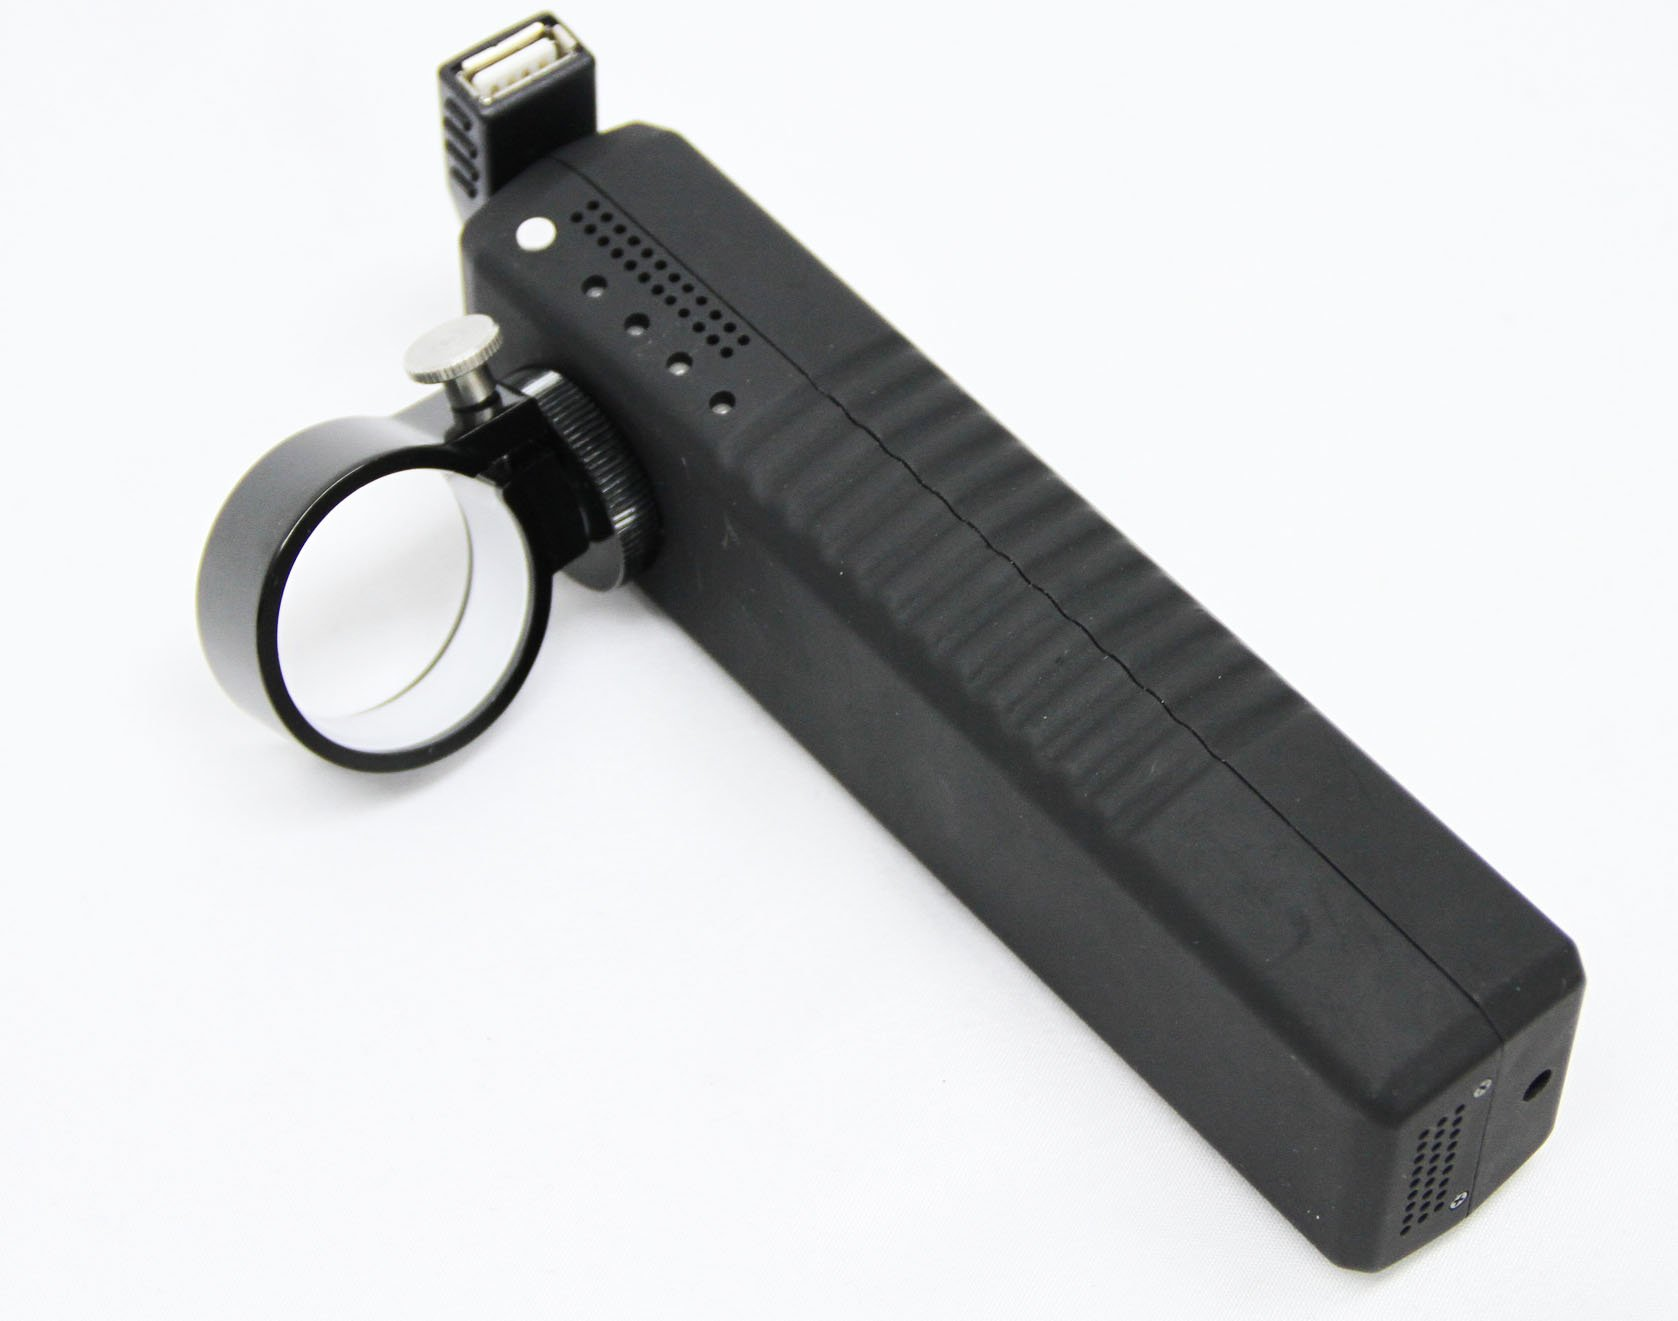 Handheld WiFi Adapter for Dino-Lite Microscope Cameras - MSVC75W